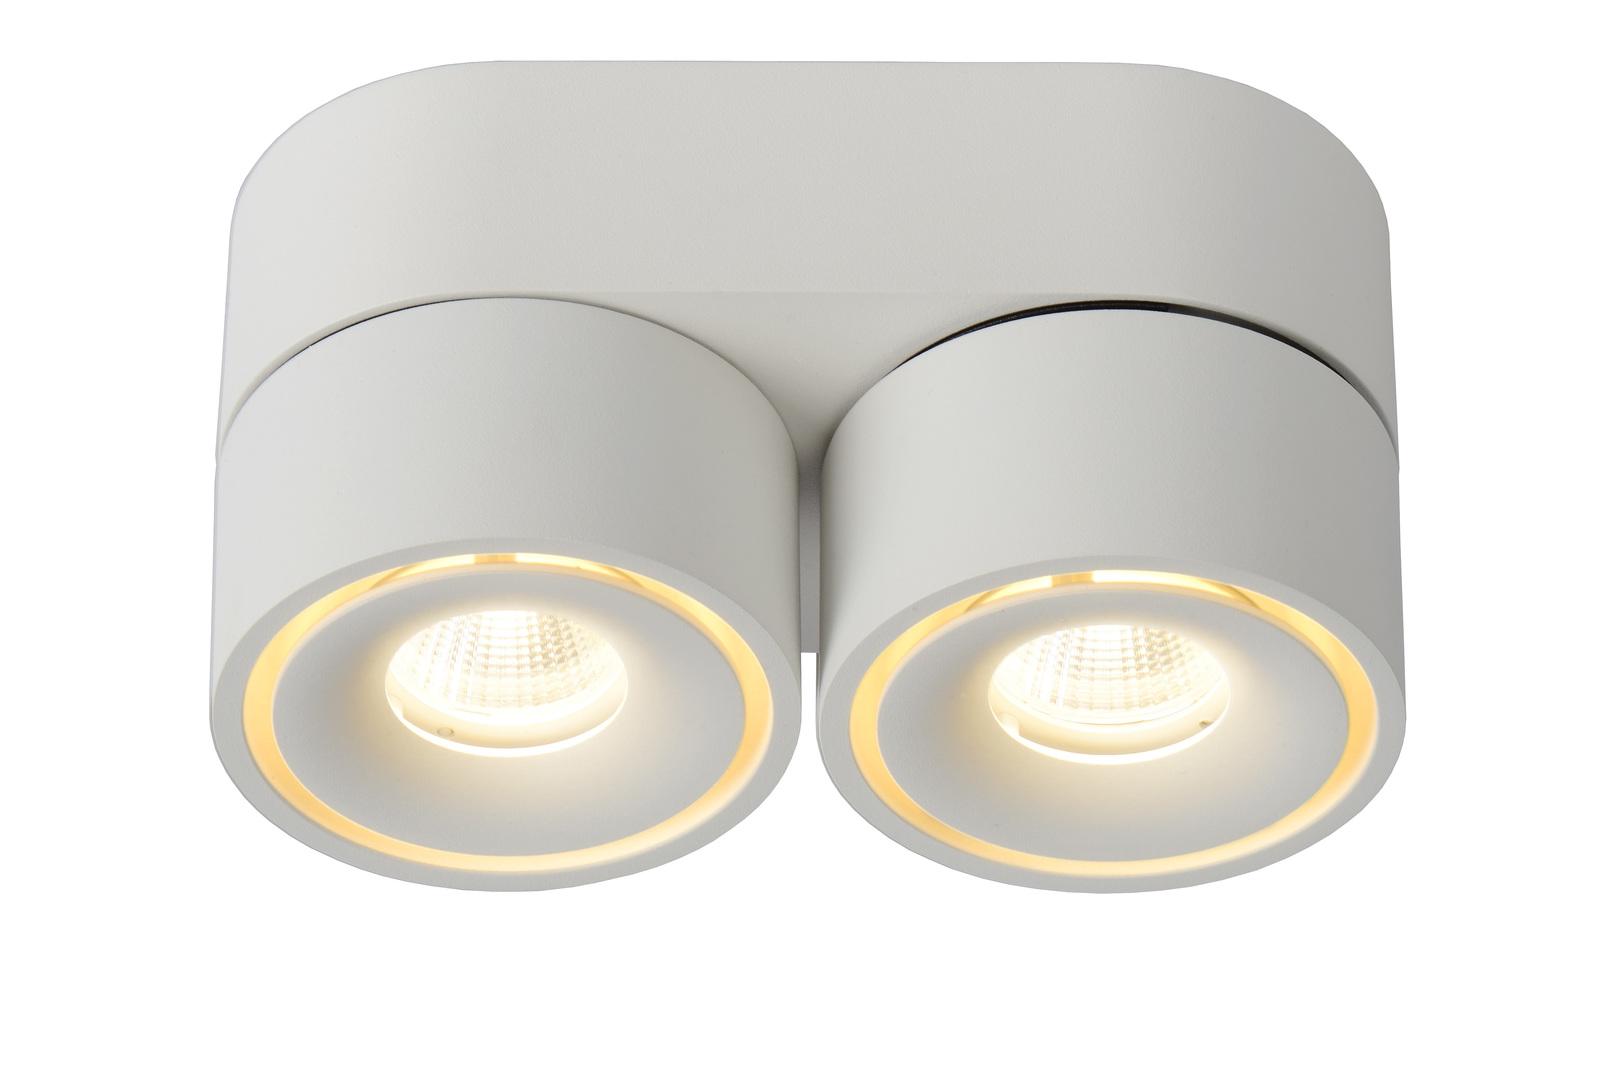 Ceiling spot spot MIKO white aluminum LED